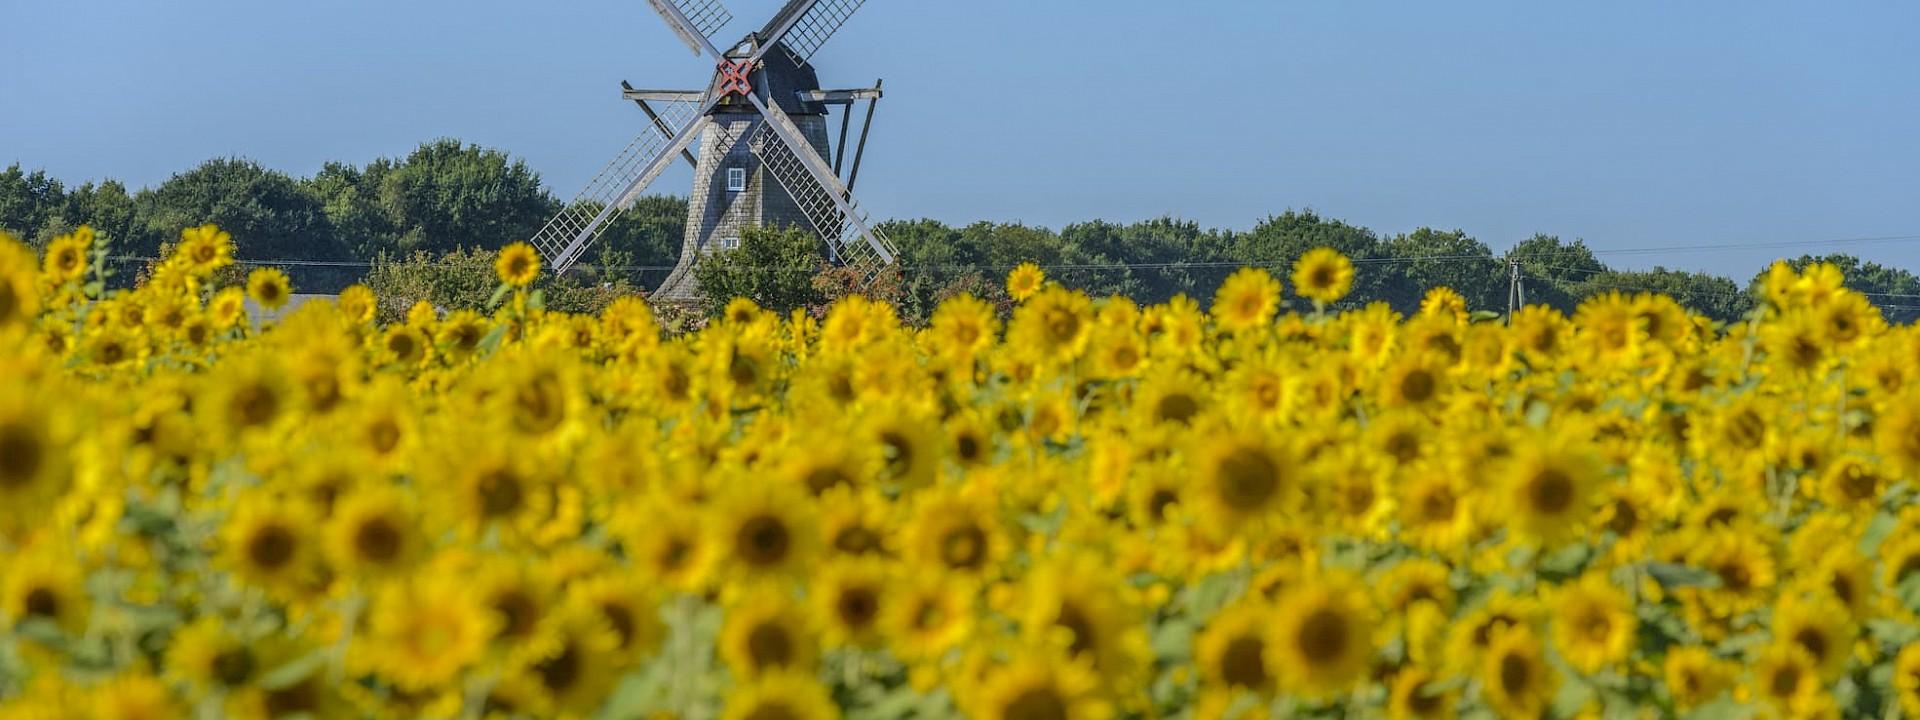 Das charmante Dorf im Münsterland Saerbeck